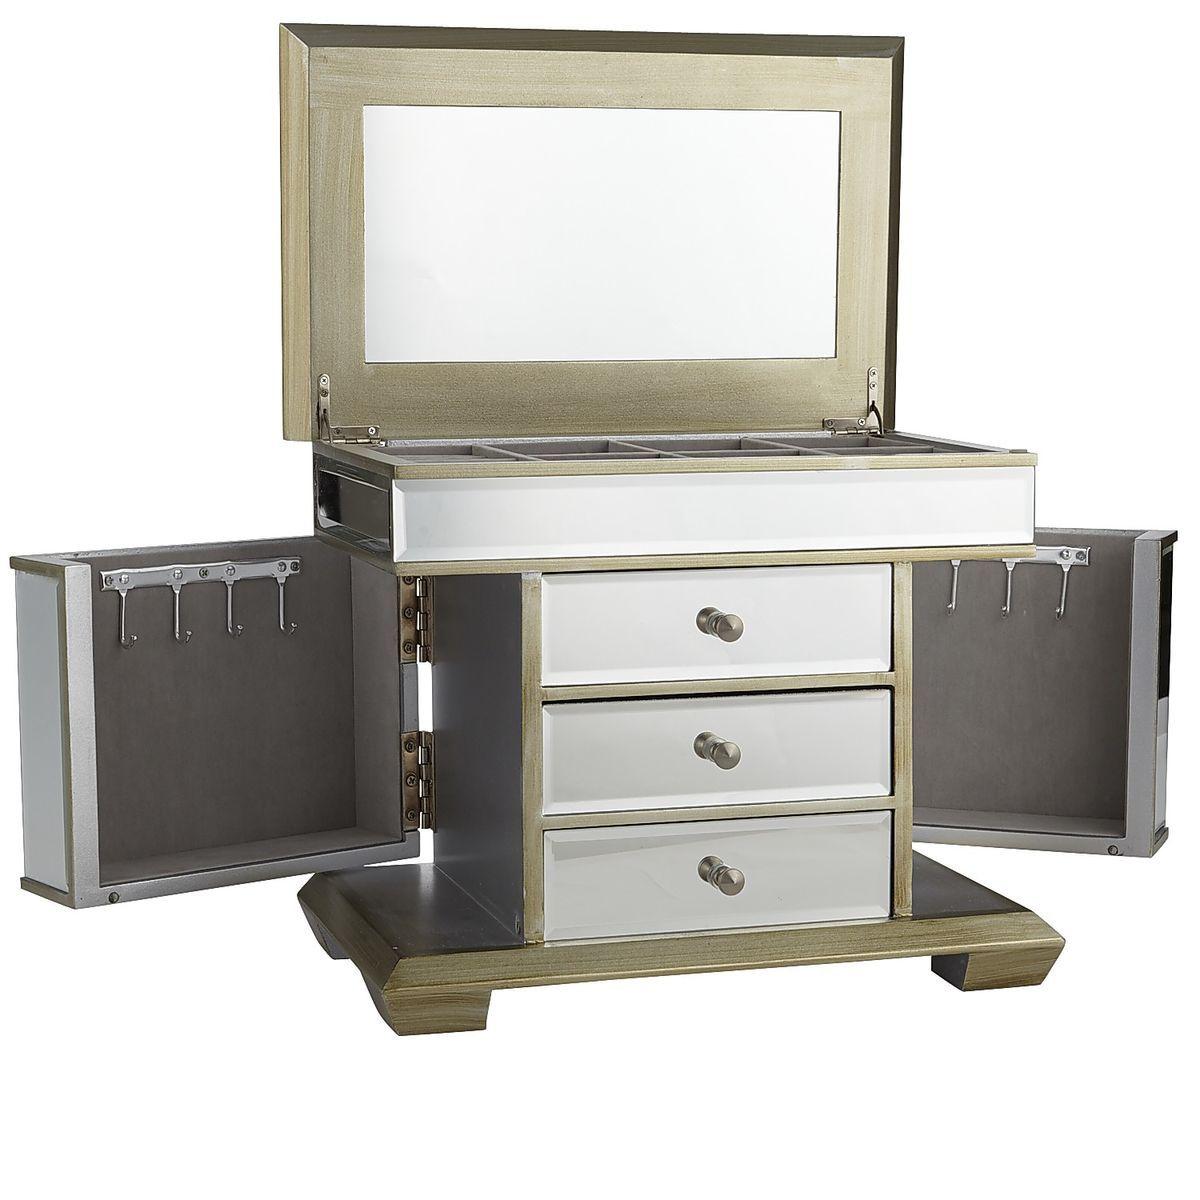 Mirrored Jewelry Box Champagne Pier 1 Imports